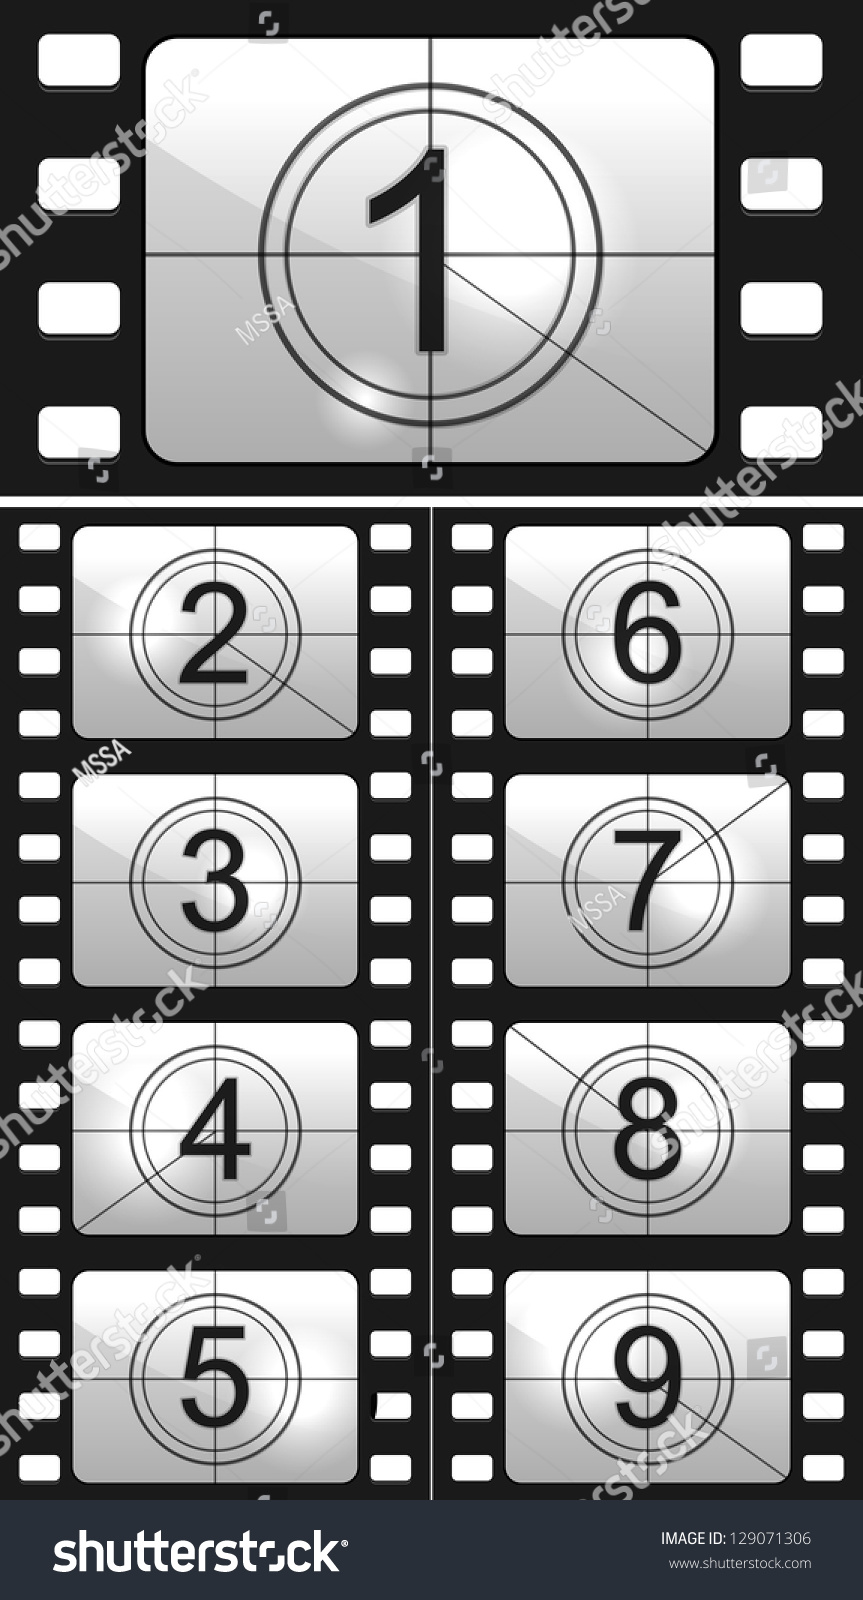 Film Countdown: Film Countdown Numbers. Vector Illustration